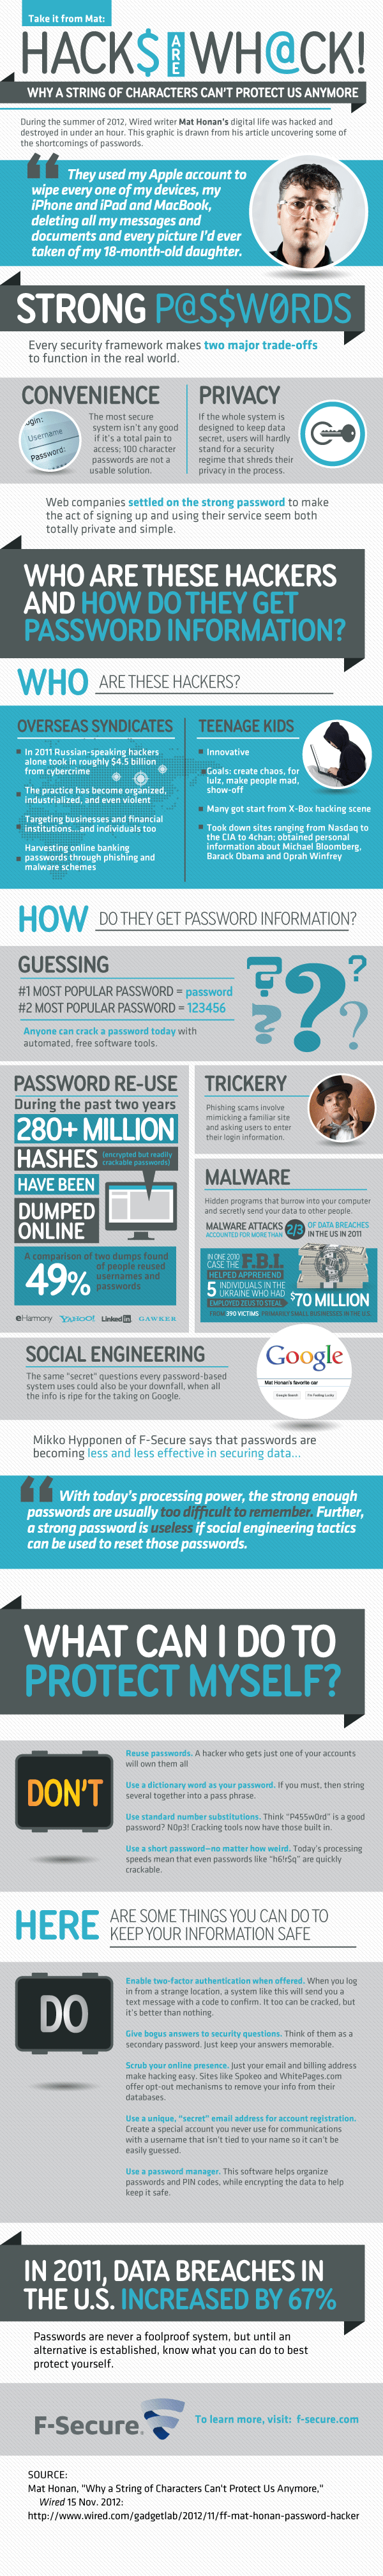 F-Secure Mat Honan Infographic